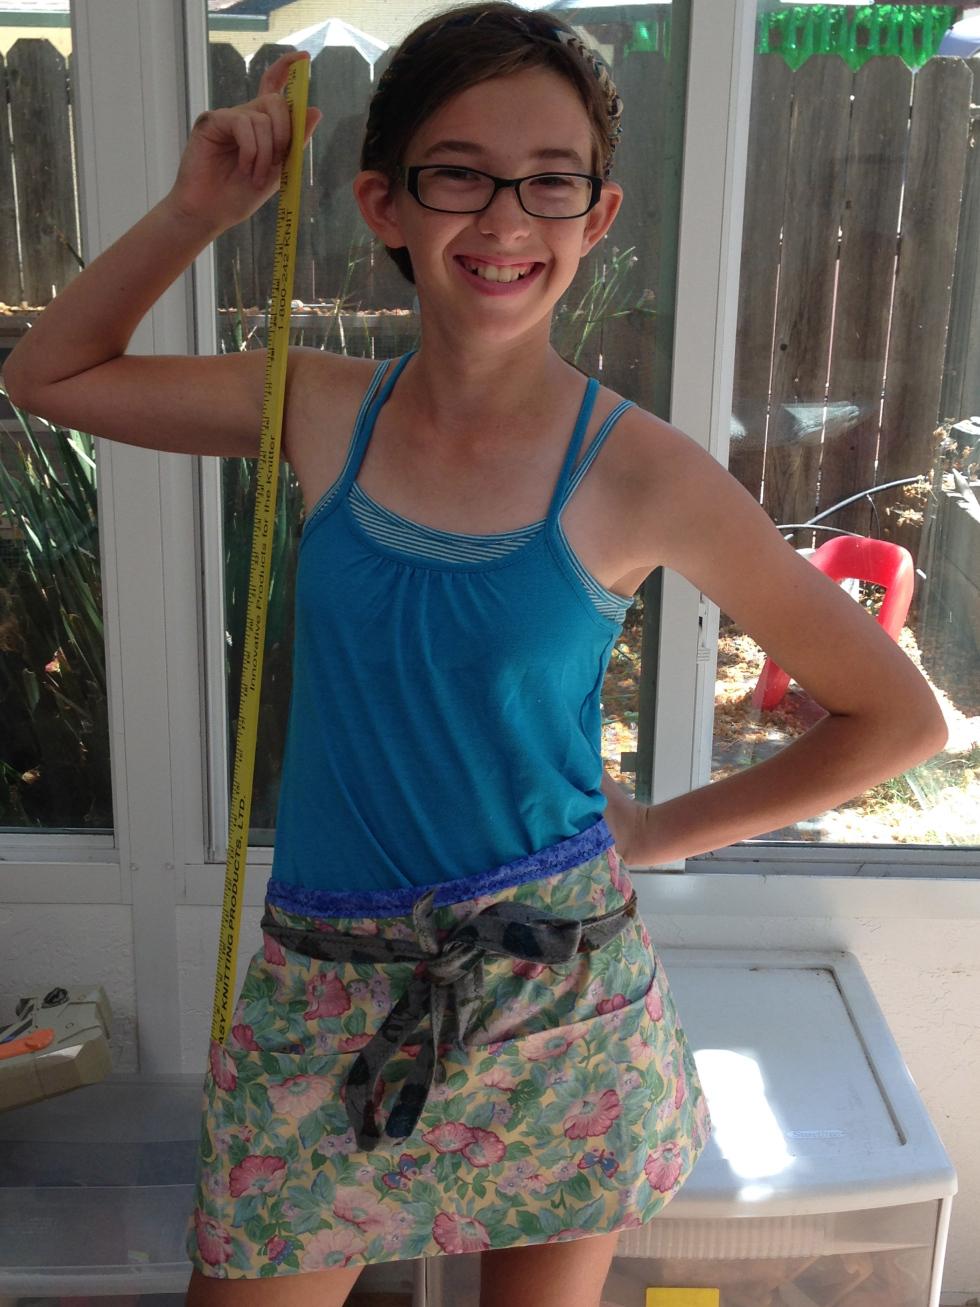 7th grader apron